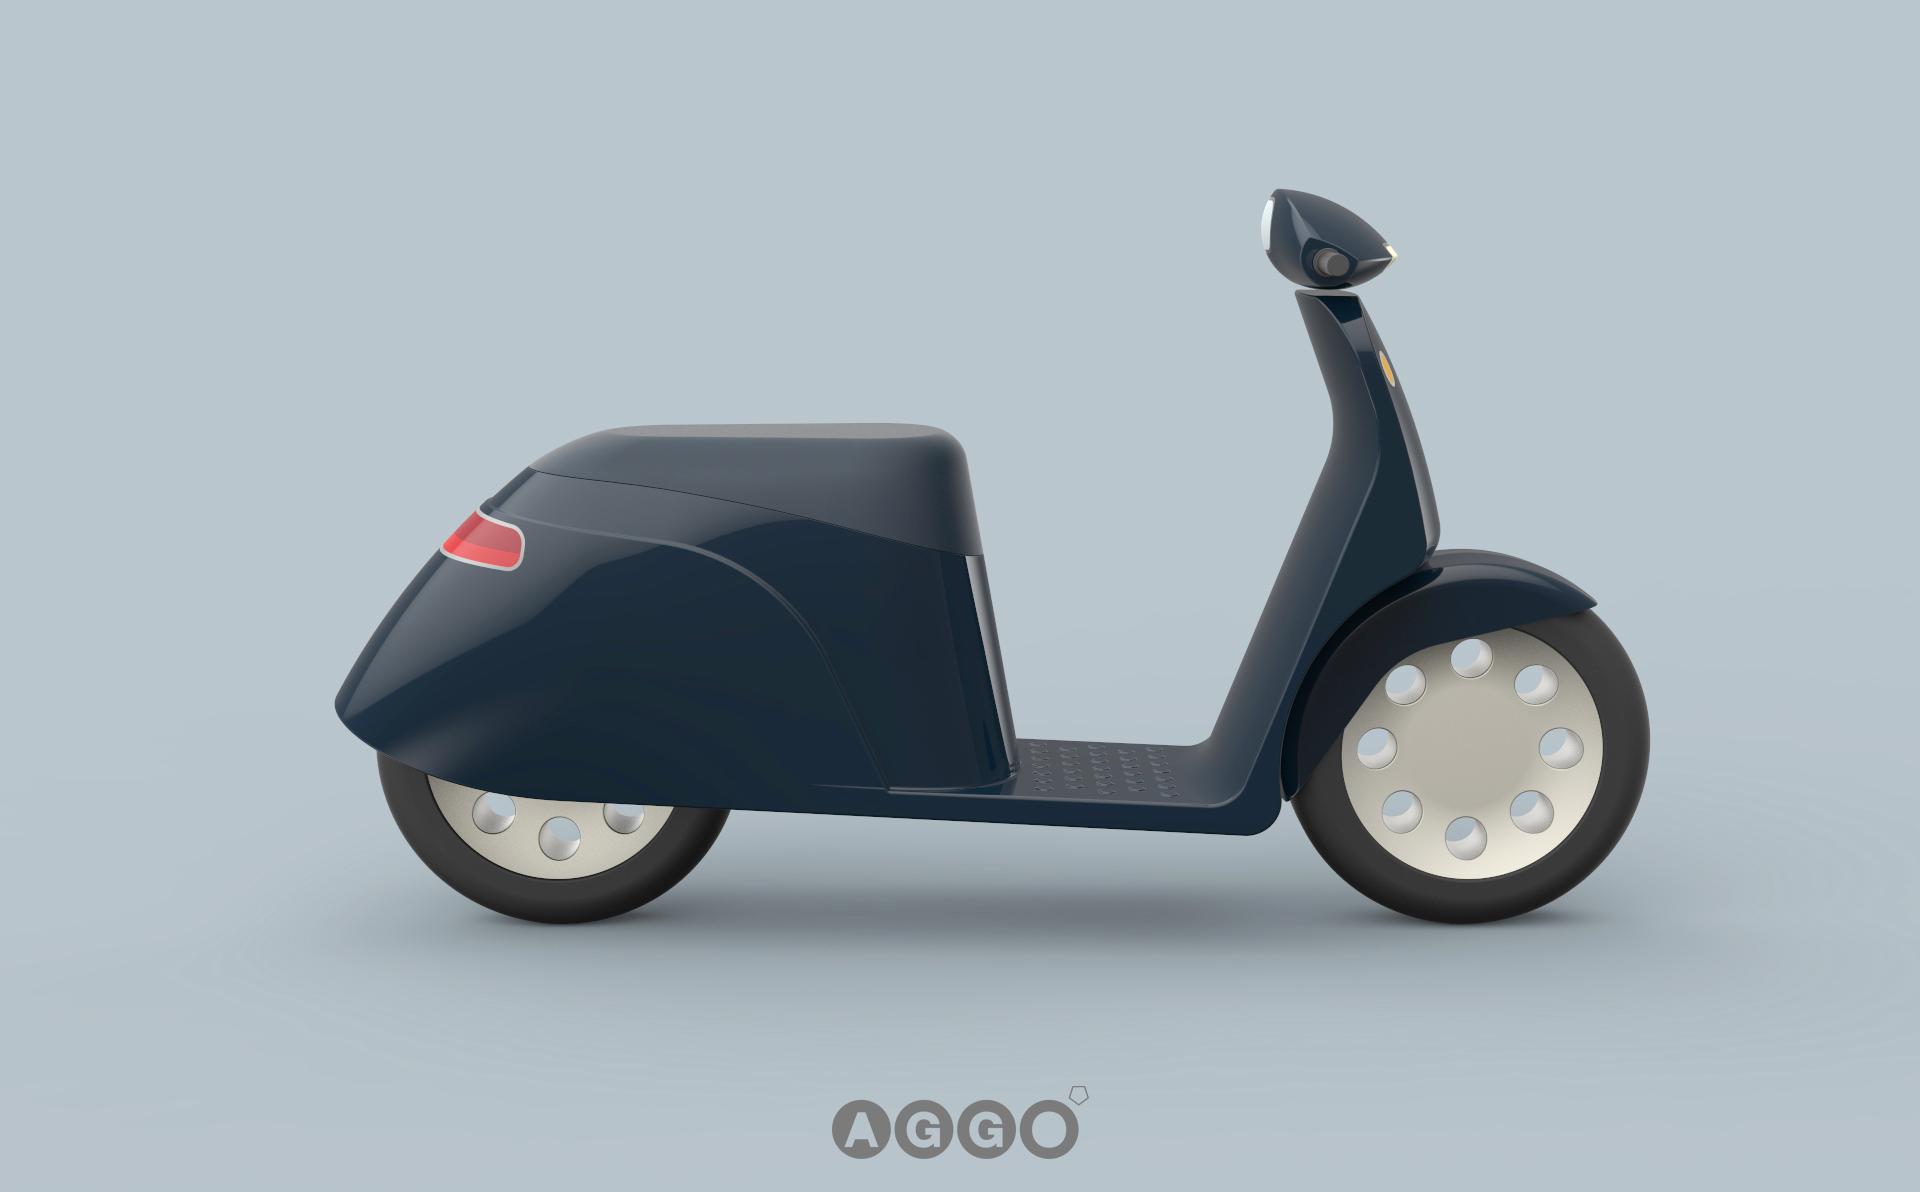 Electric_Bike_by_Aggo_001.jpg